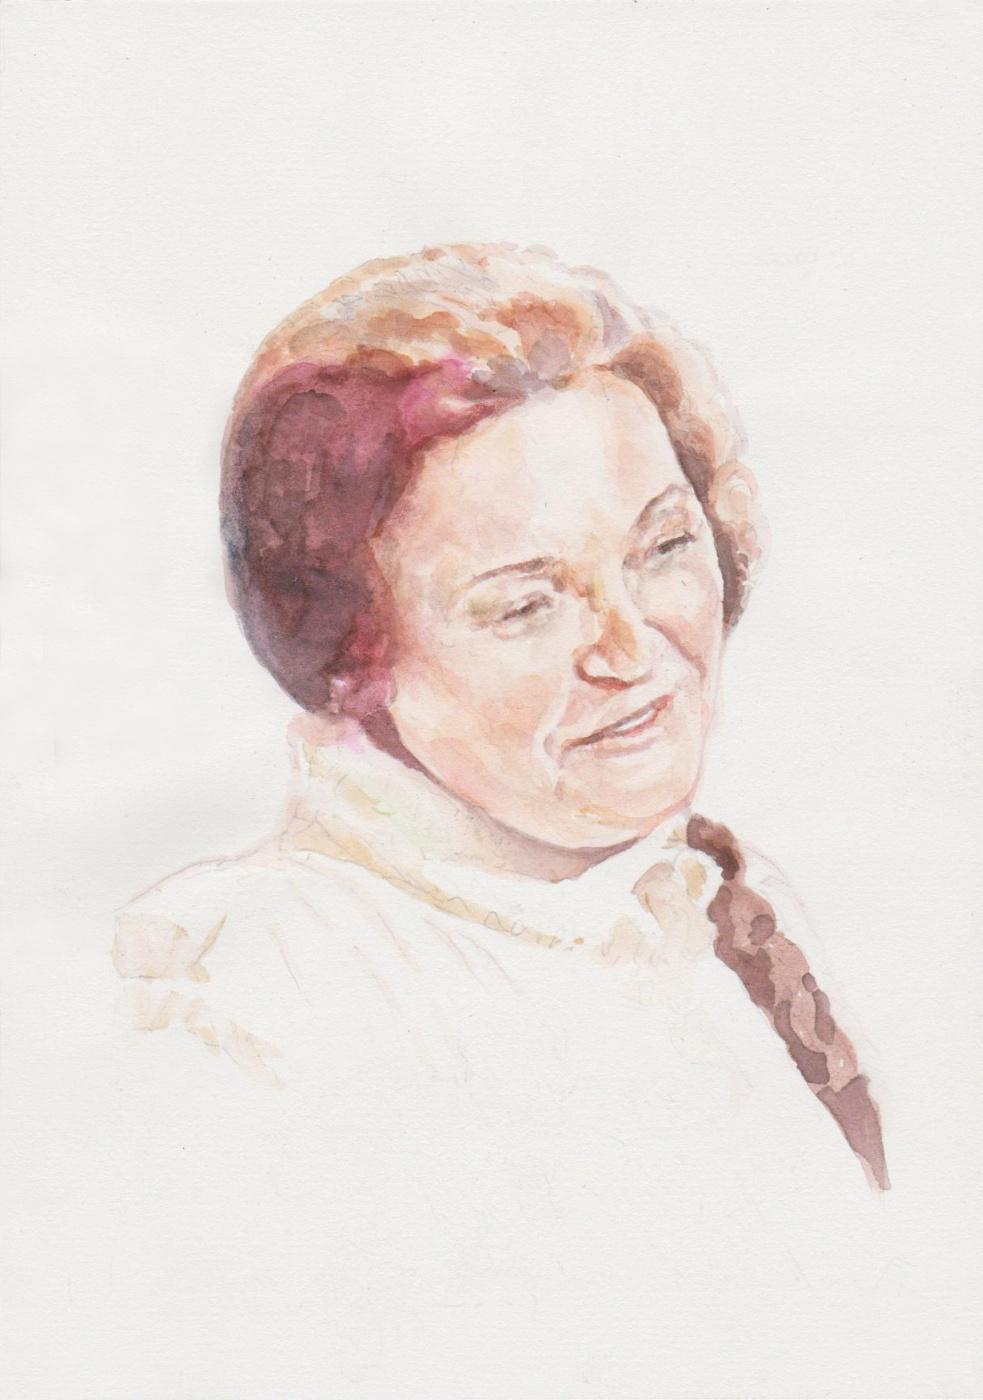 Ivan Alexandrovich Dolgorukov. Watercolor portrait of Altai poetess V.Yu.Zolotaryova